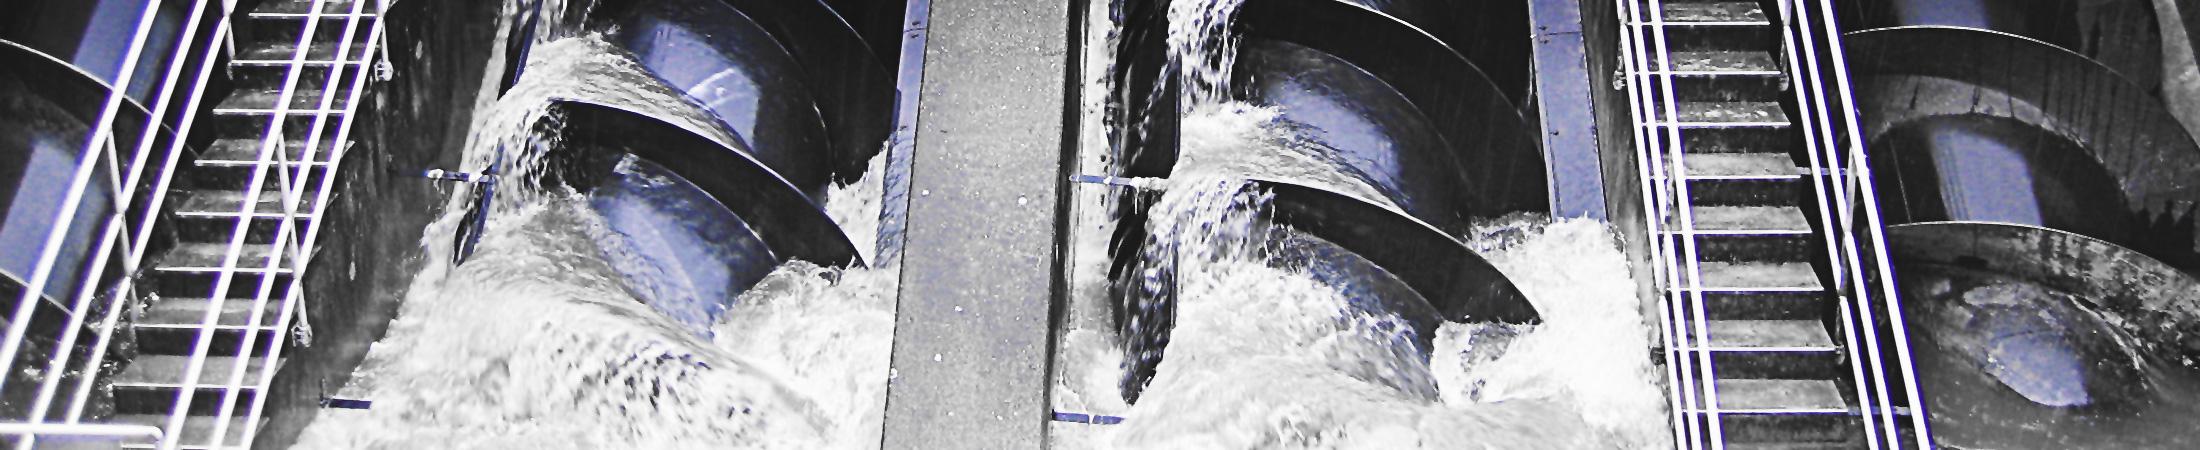 Wastewater Treatment <b>Optimized</b>